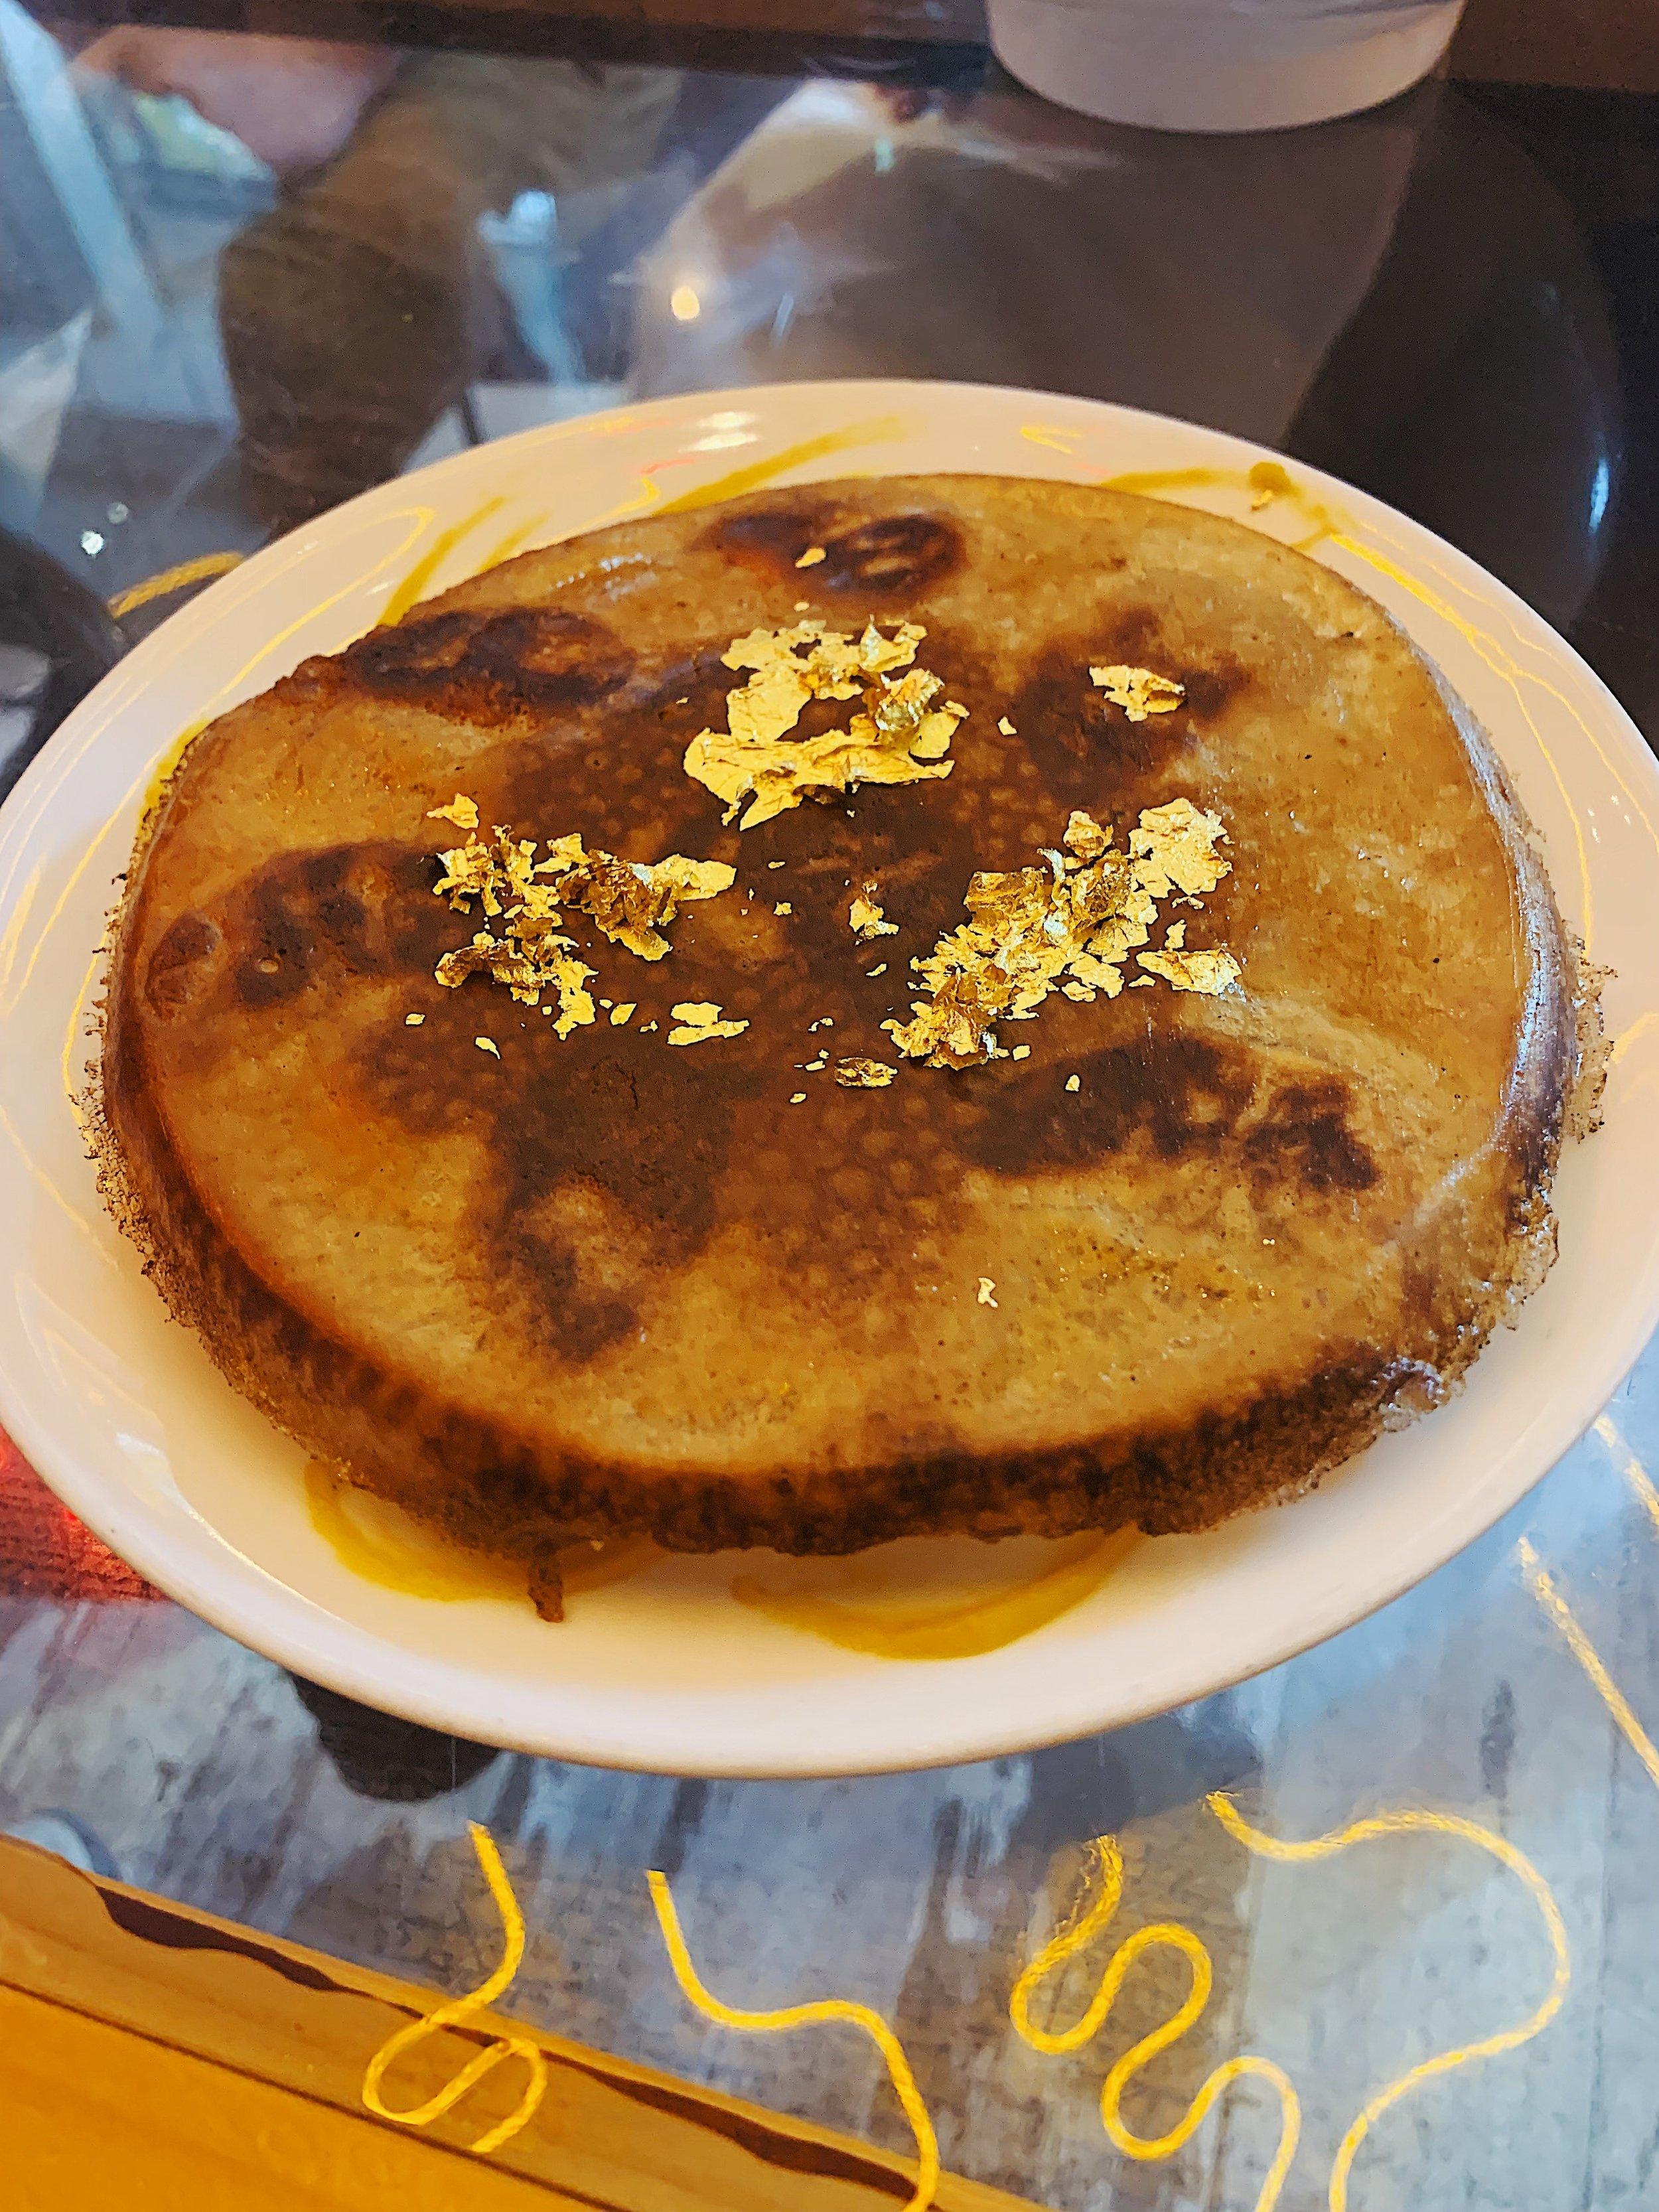 Pegao Norteño; Lamb pot sticker, aderezo norteño, crispy cumin lace, gold flake